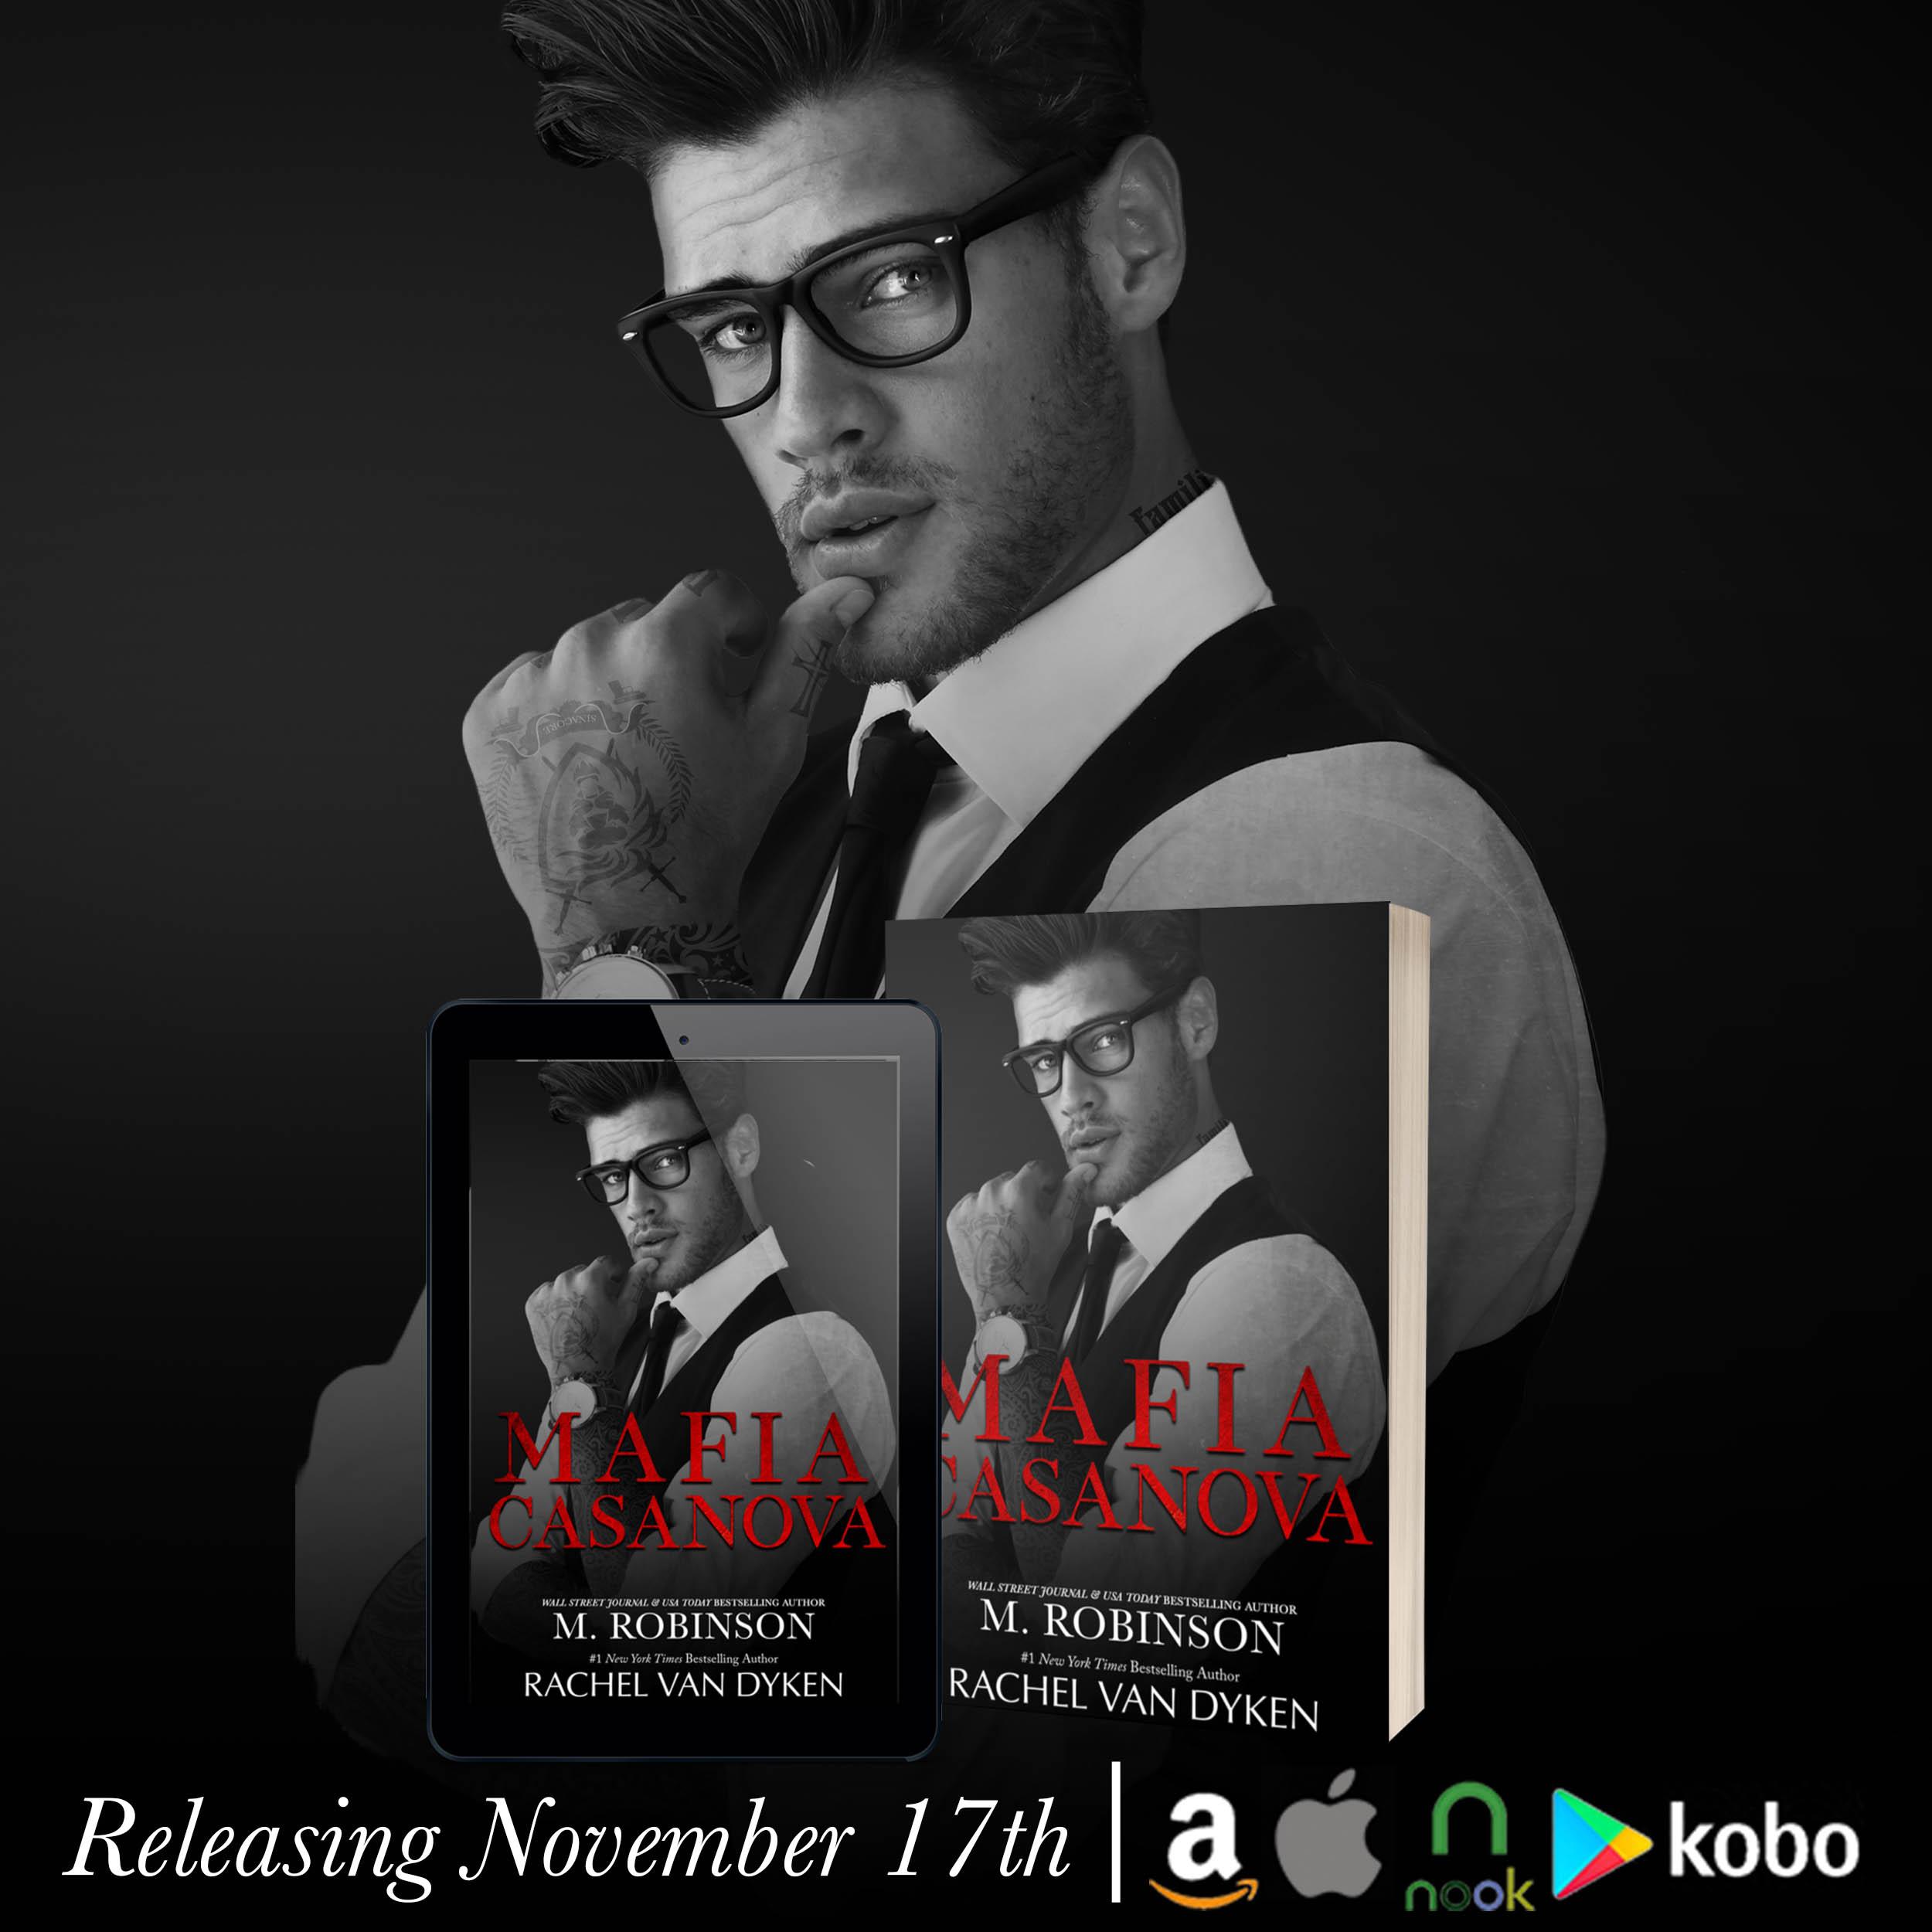 Mafia Casanova by M. Robinson & Rachel Van Dyken Cover Reveal